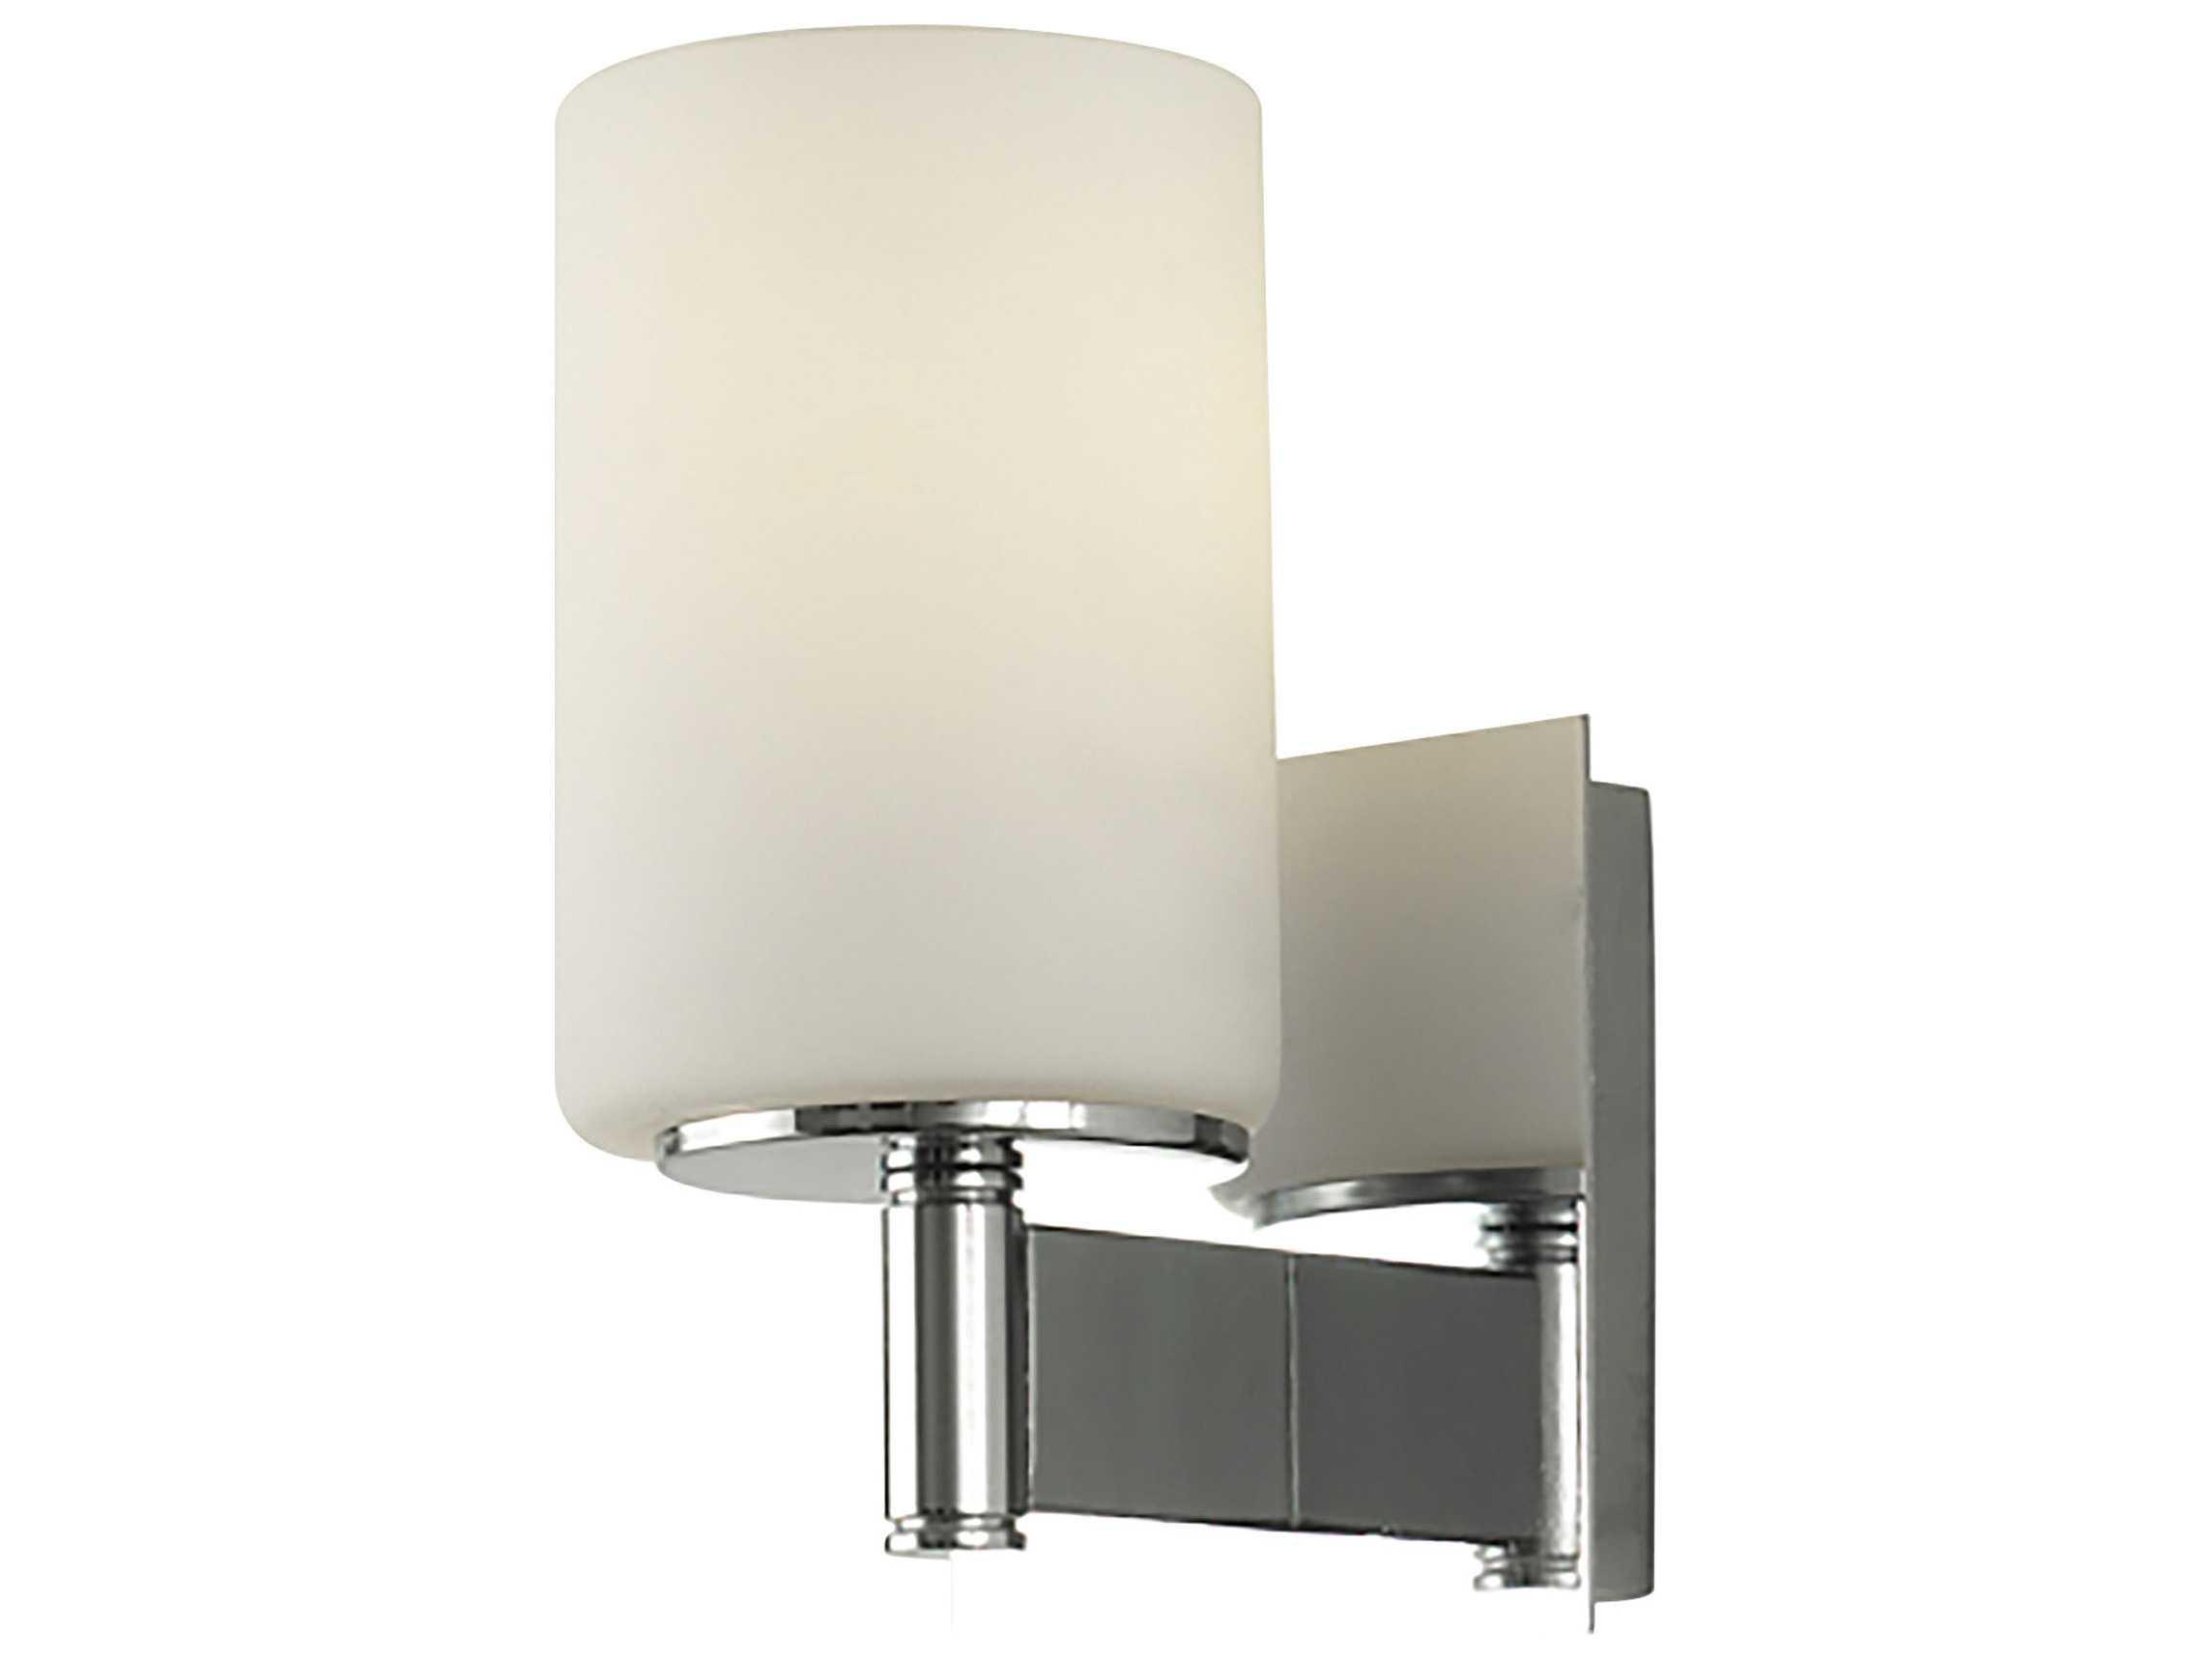 Alico Truss Chrome & White Opal Glass Vanity Light ALCBV70011015